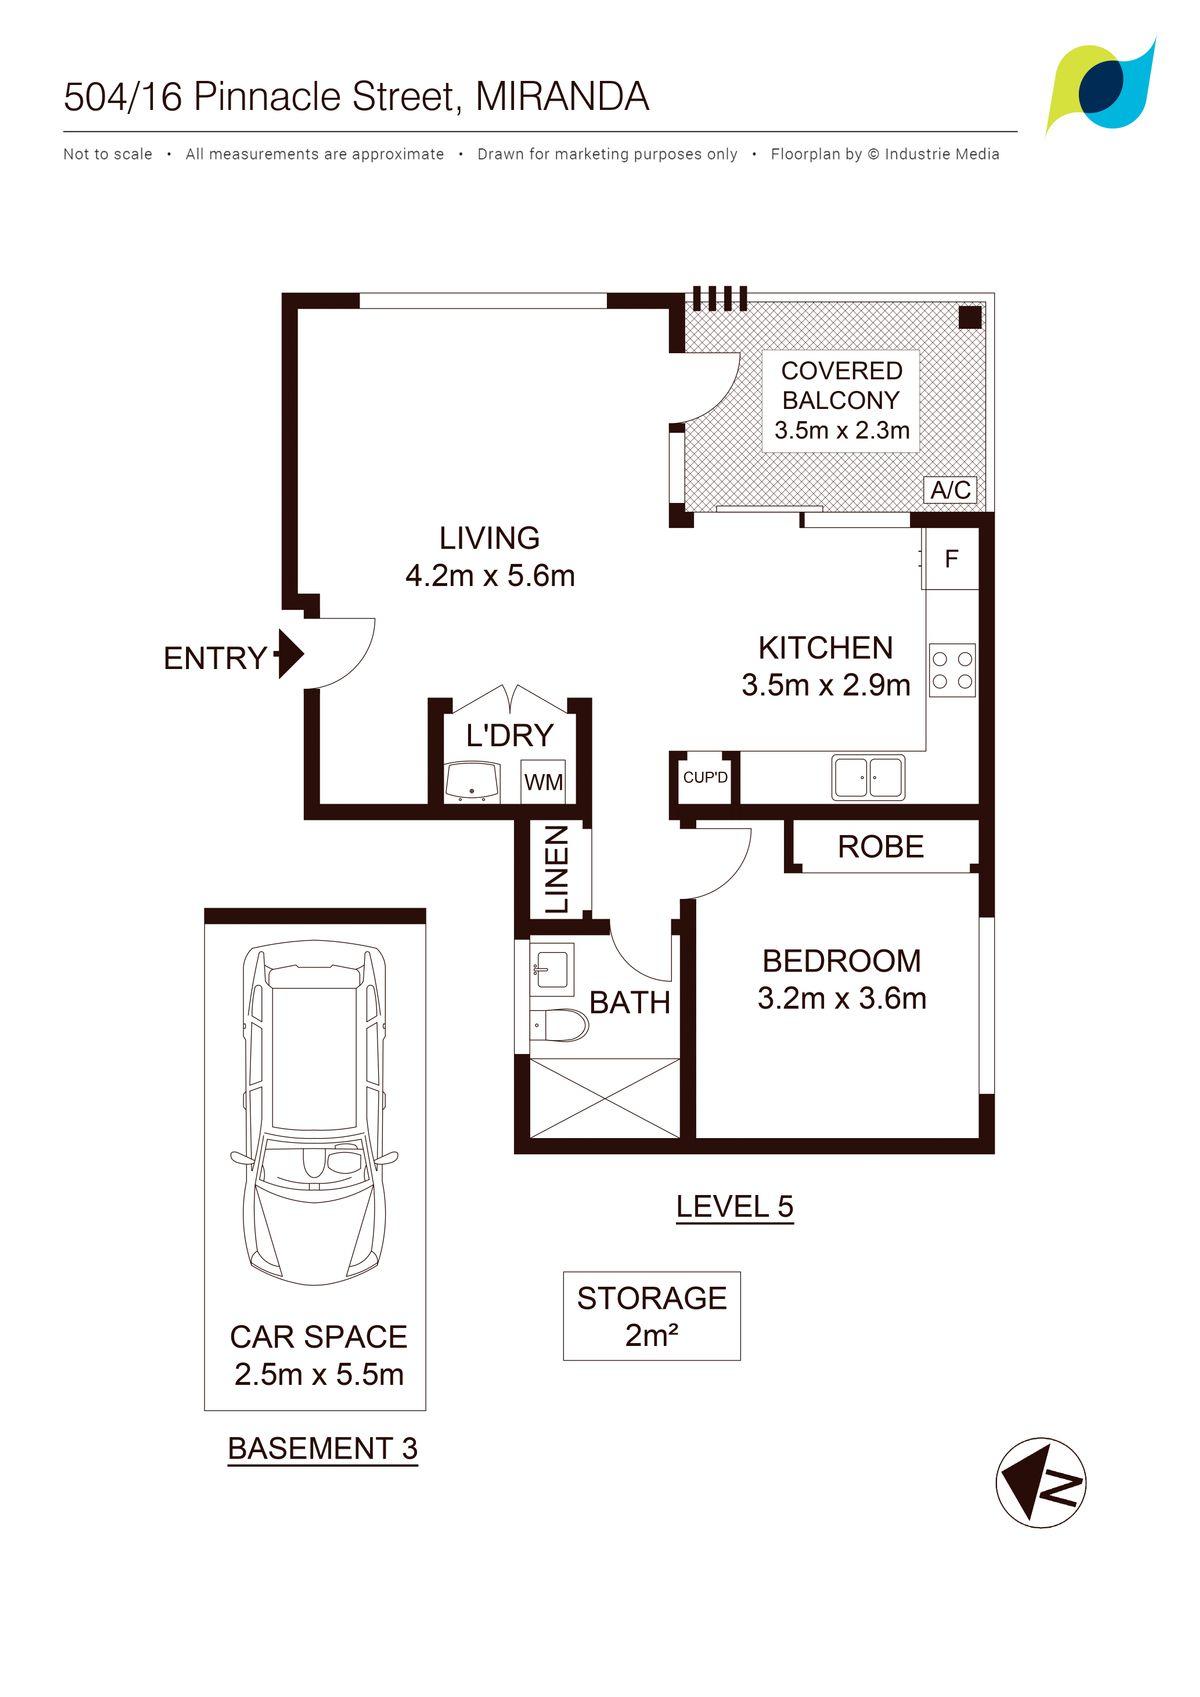 Property Report for 504/16 Pinnacle Street, Miranda NSW 2228